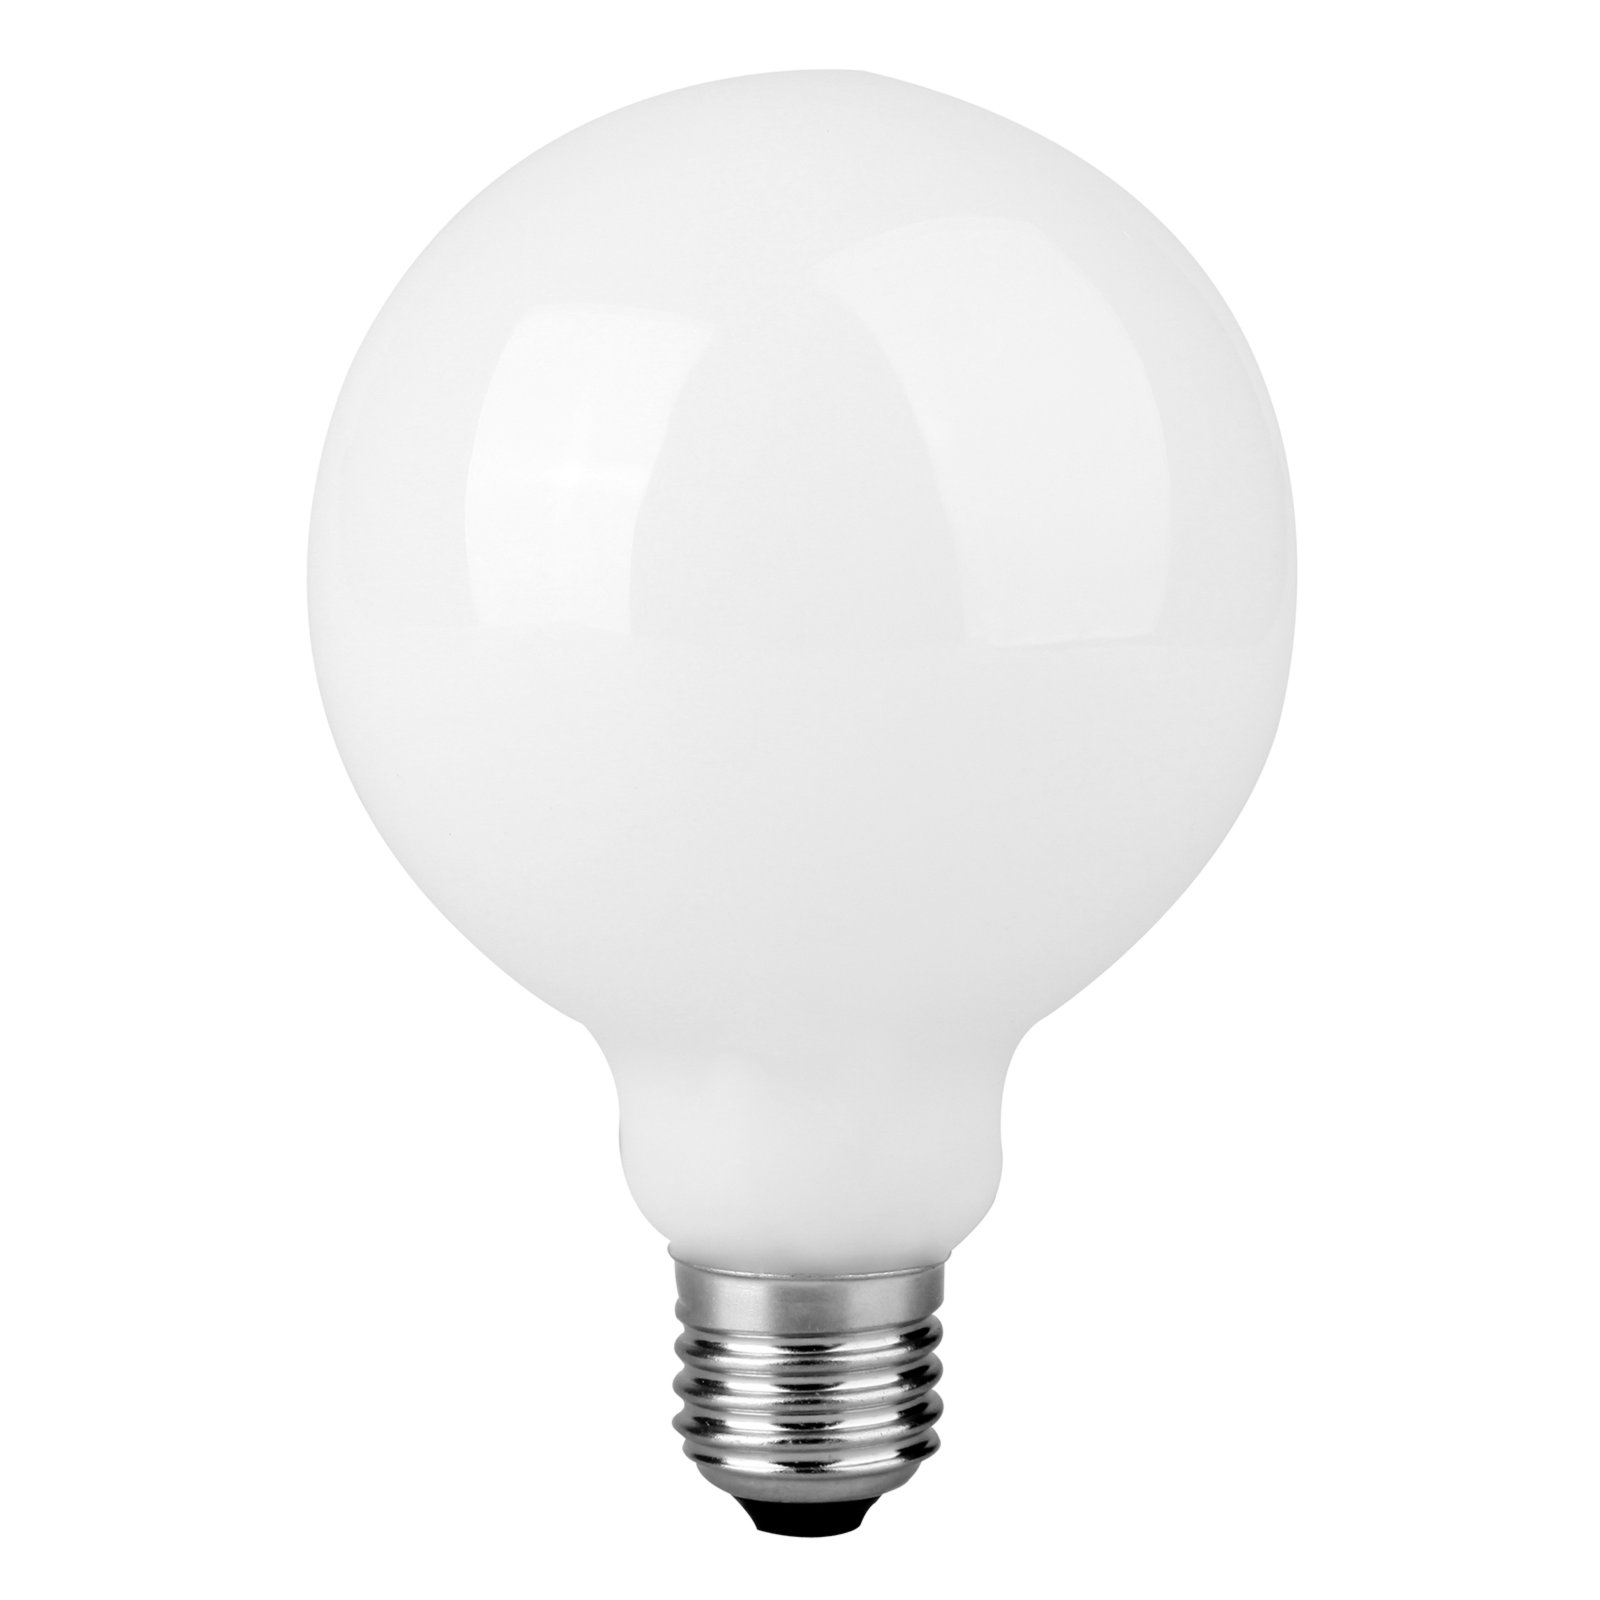 led leuchtmitel lightme g95 8 watt warmwei leuchtmittel lampen m belhaus roller. Black Bedroom Furniture Sets. Home Design Ideas